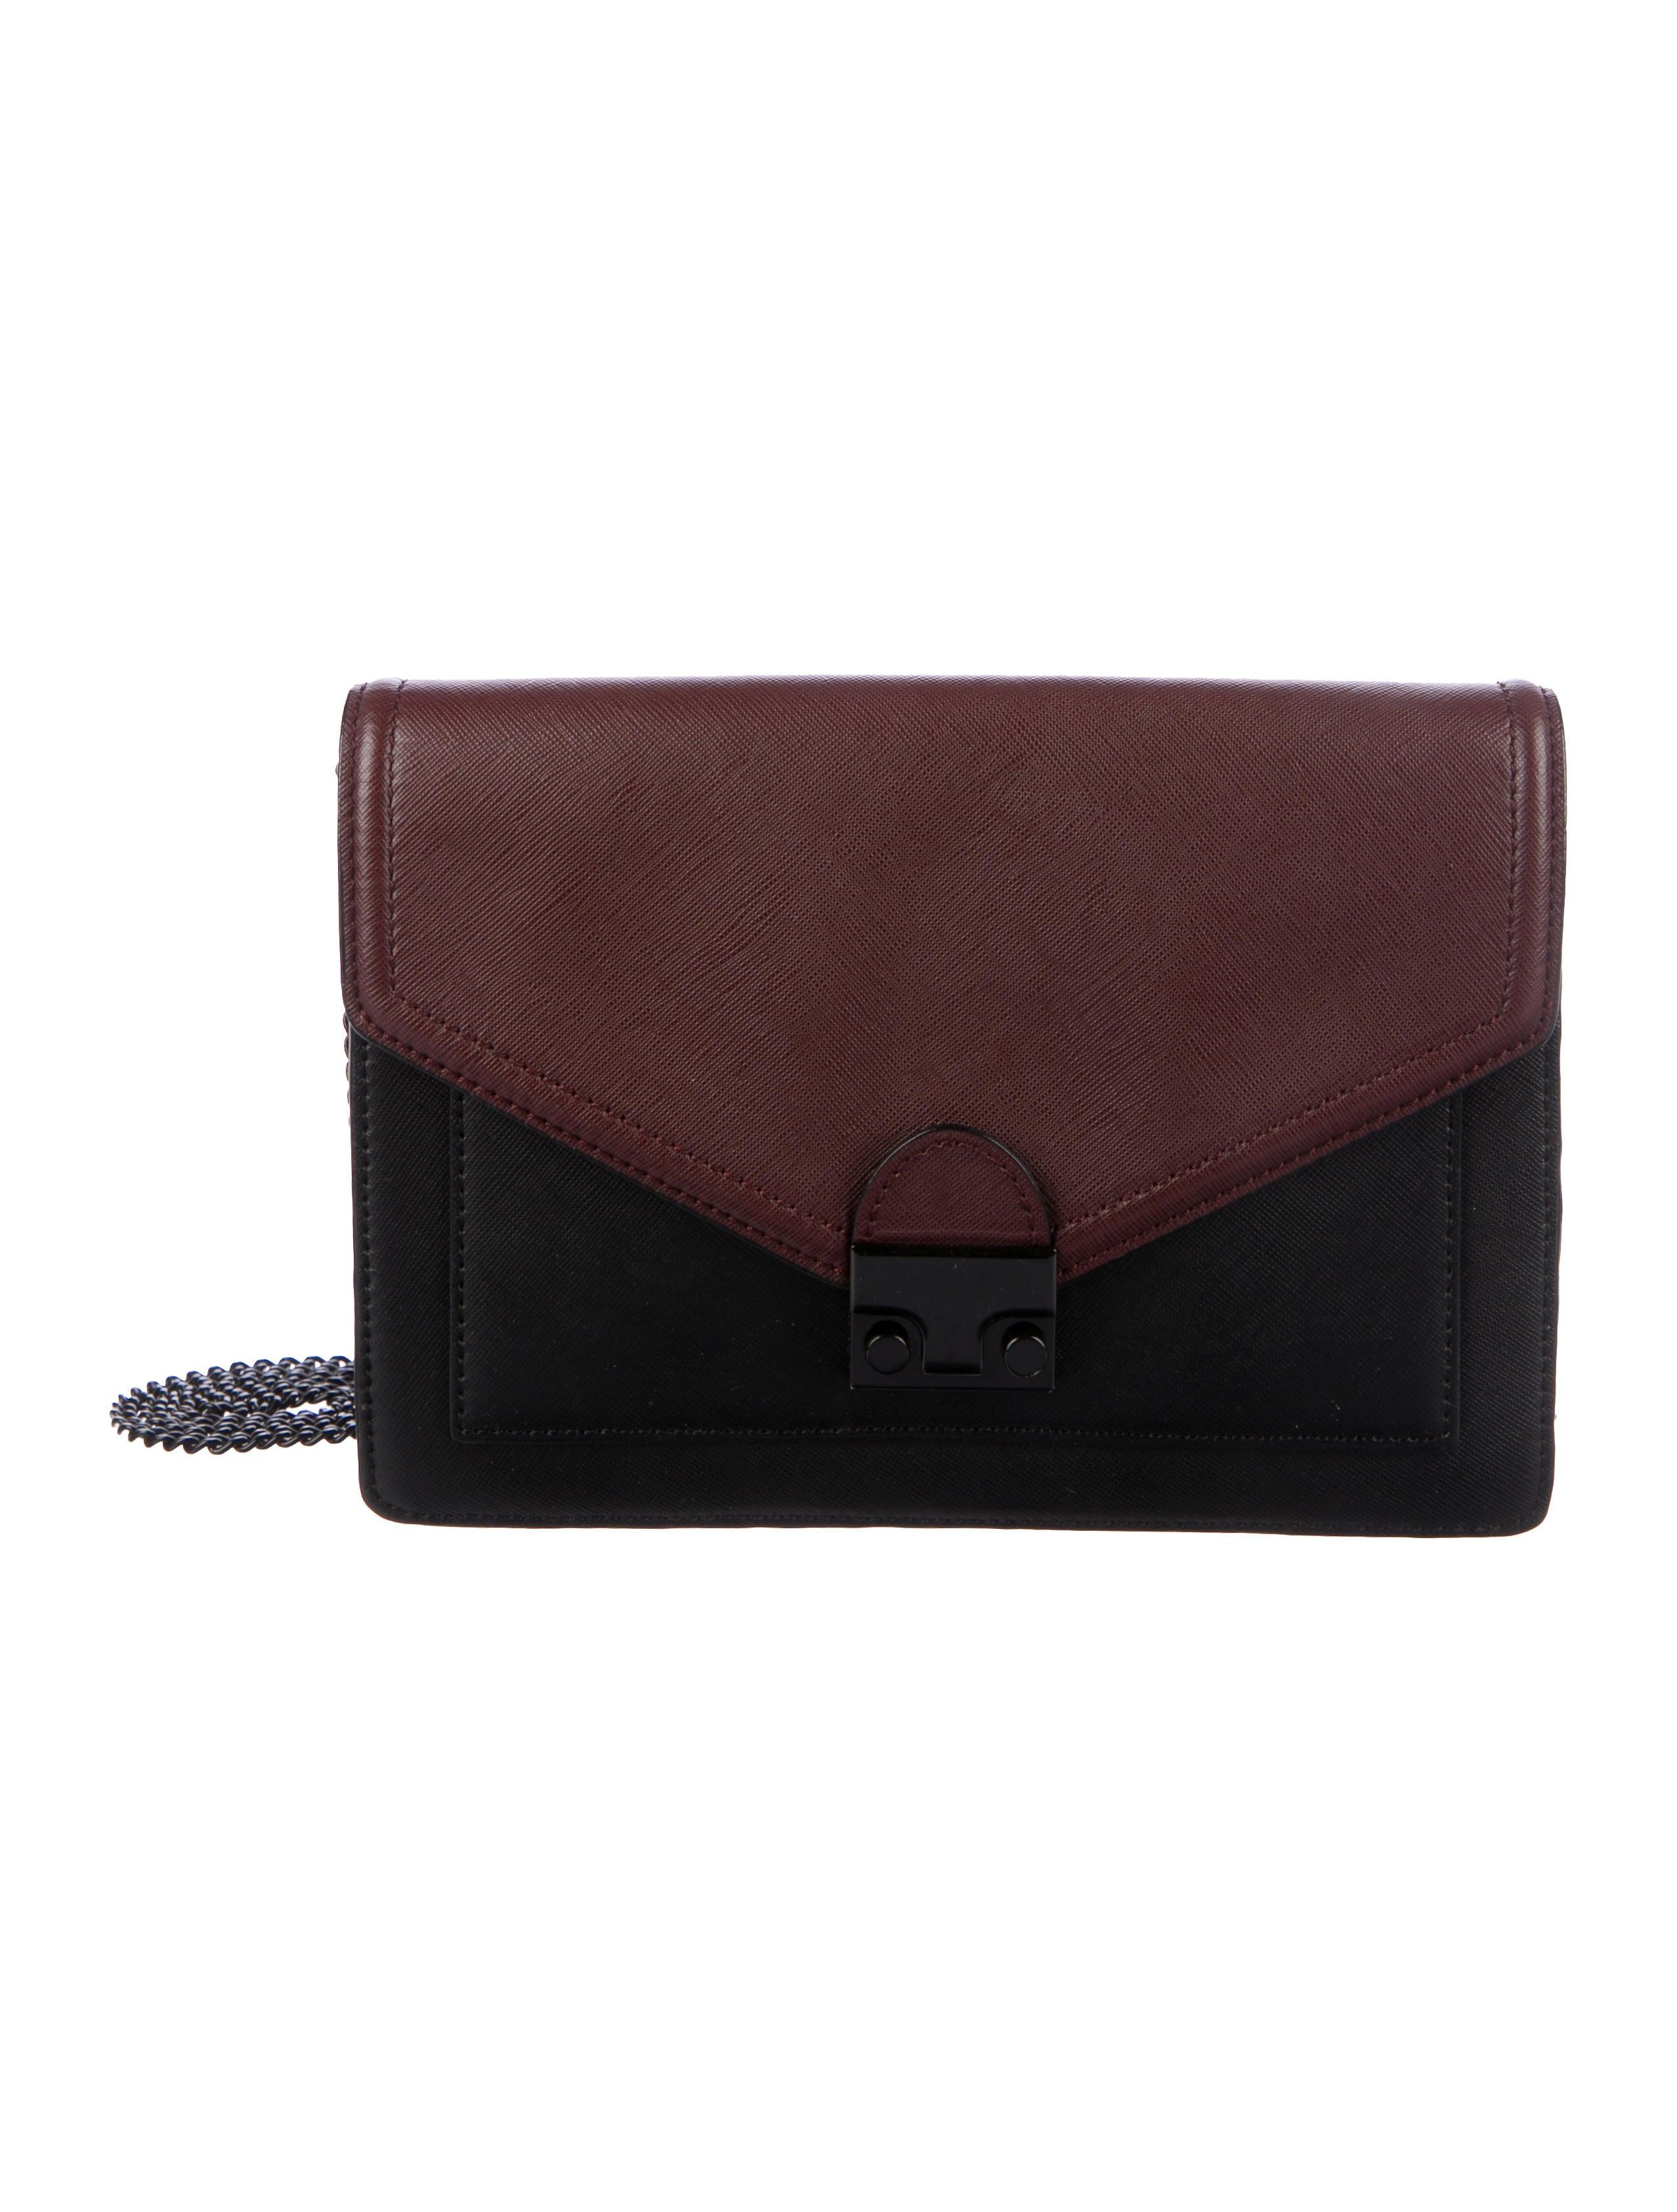 loeffler randall leather junior lock crossbody bag